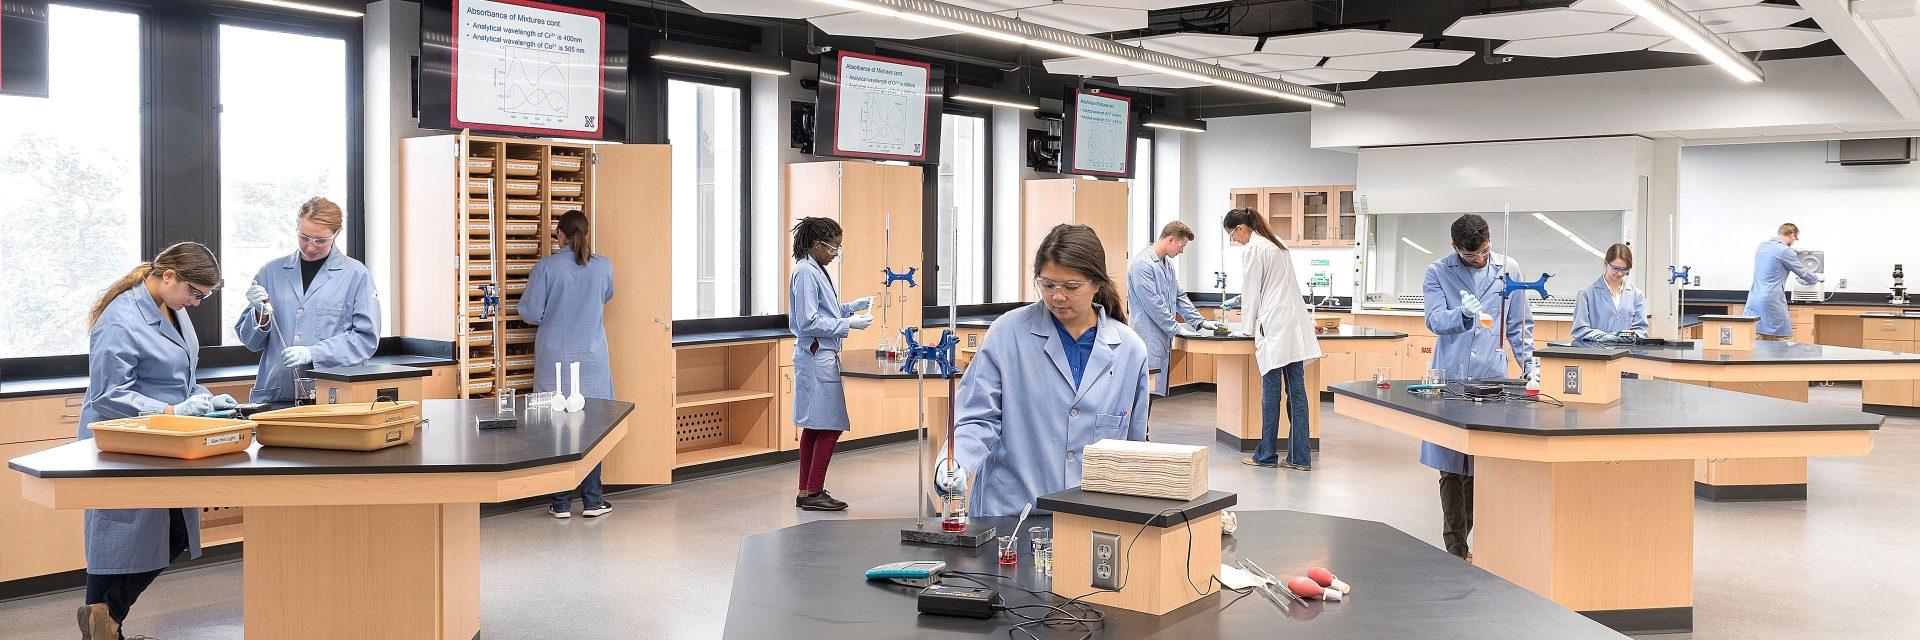 Hamilton Hall Chemistry Laboratory Design